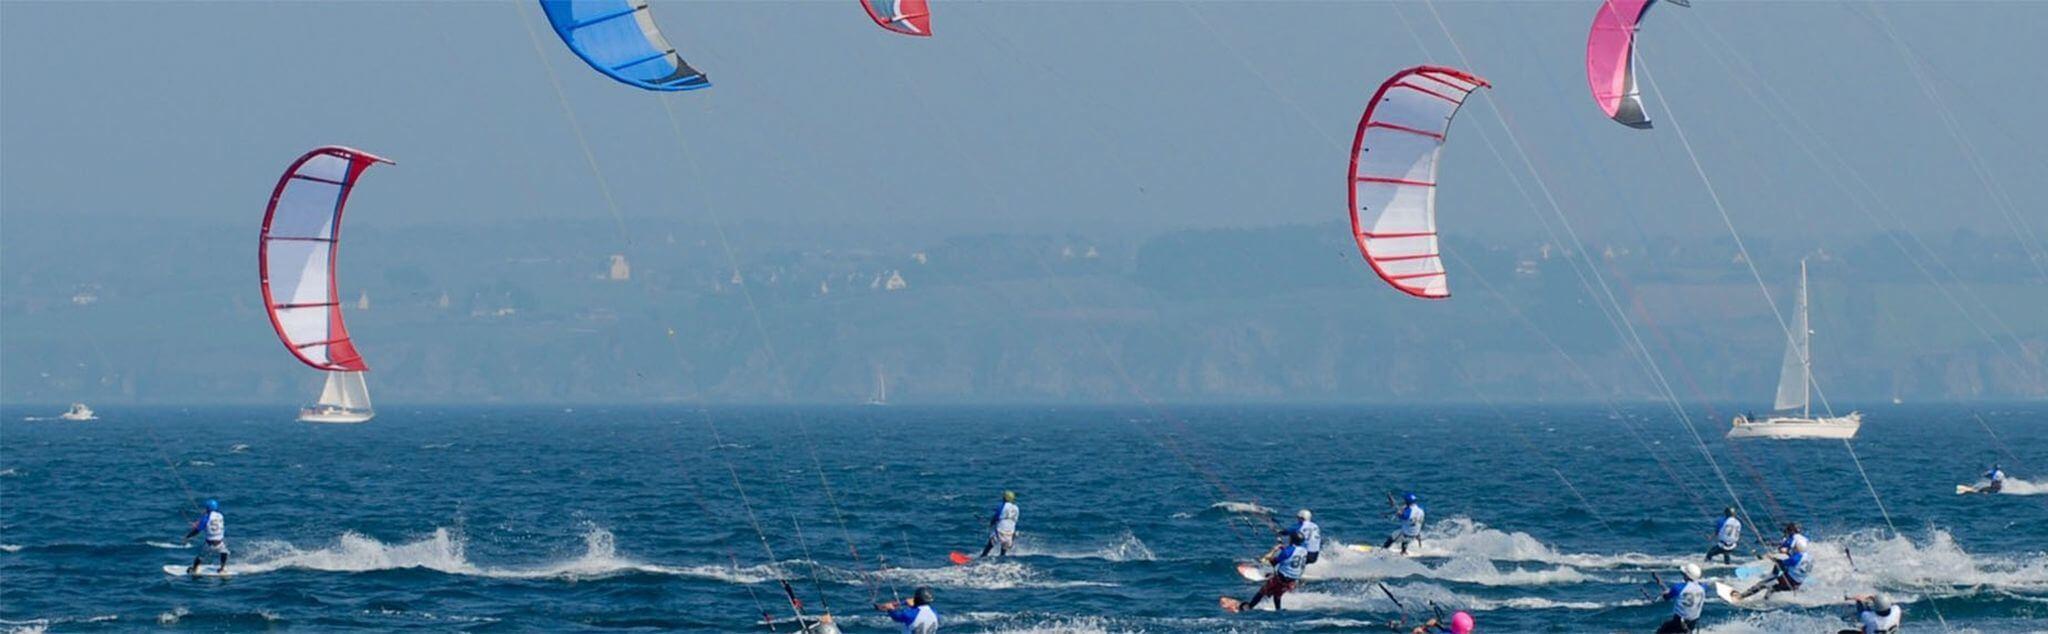 Kitesurfing Camps in Spain